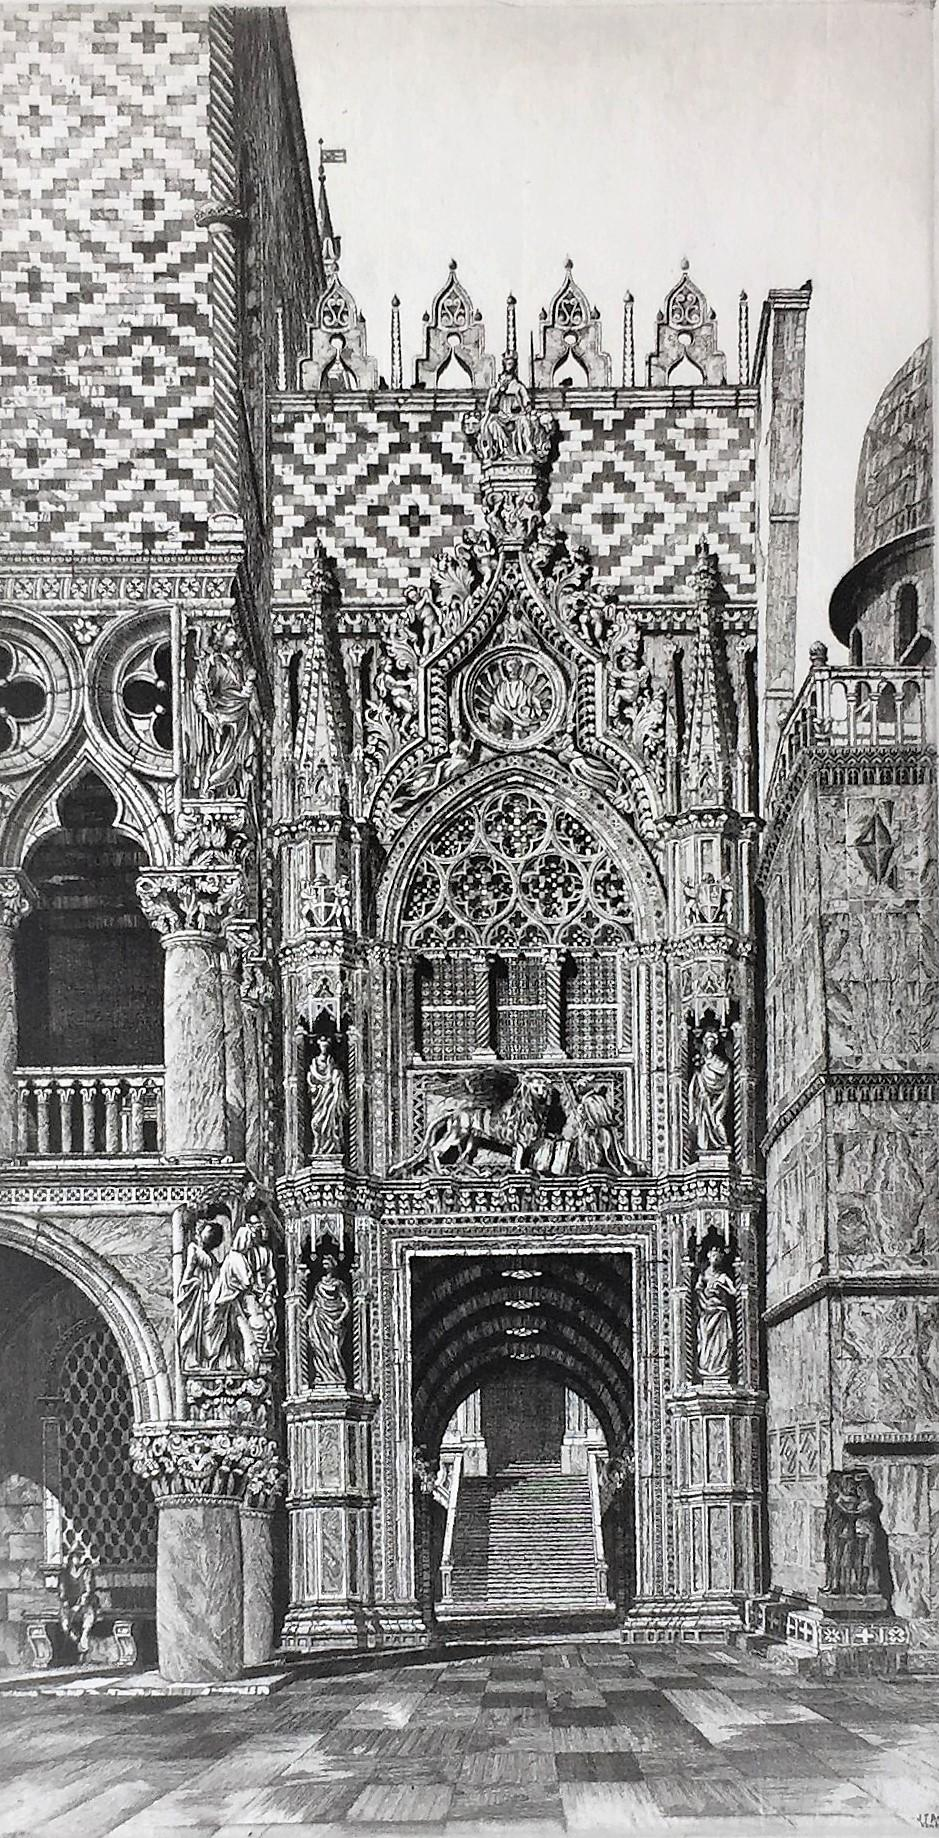 Enchanted Doorway,Venezia (La Porta della Carta, Venezia '29)